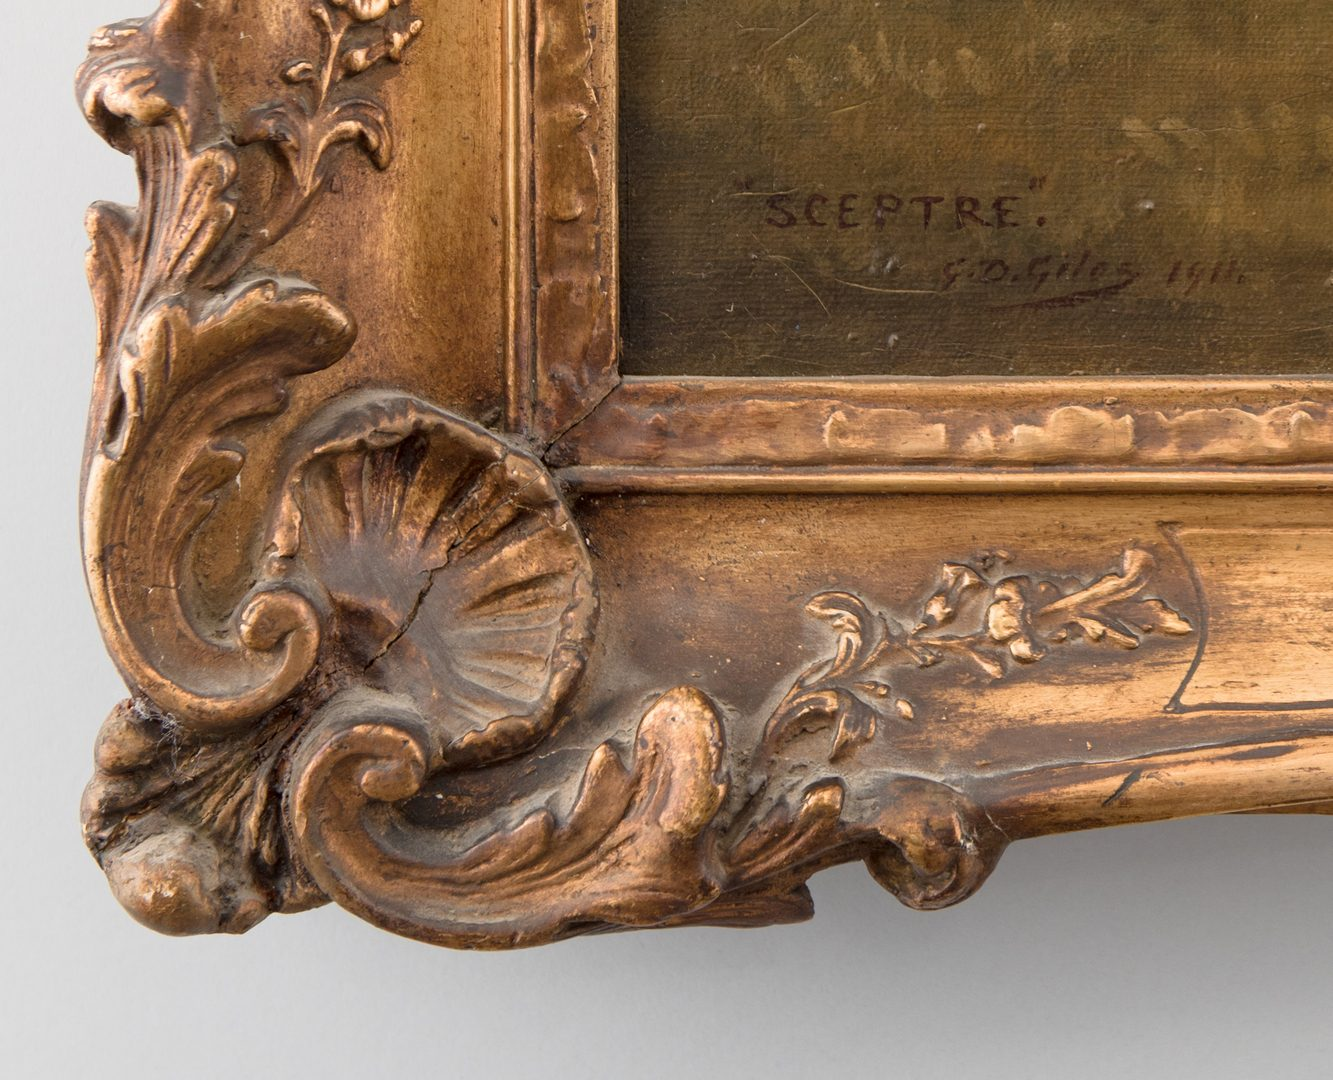 Lot 89: G.D. Giles oil on canvas, Sceptre